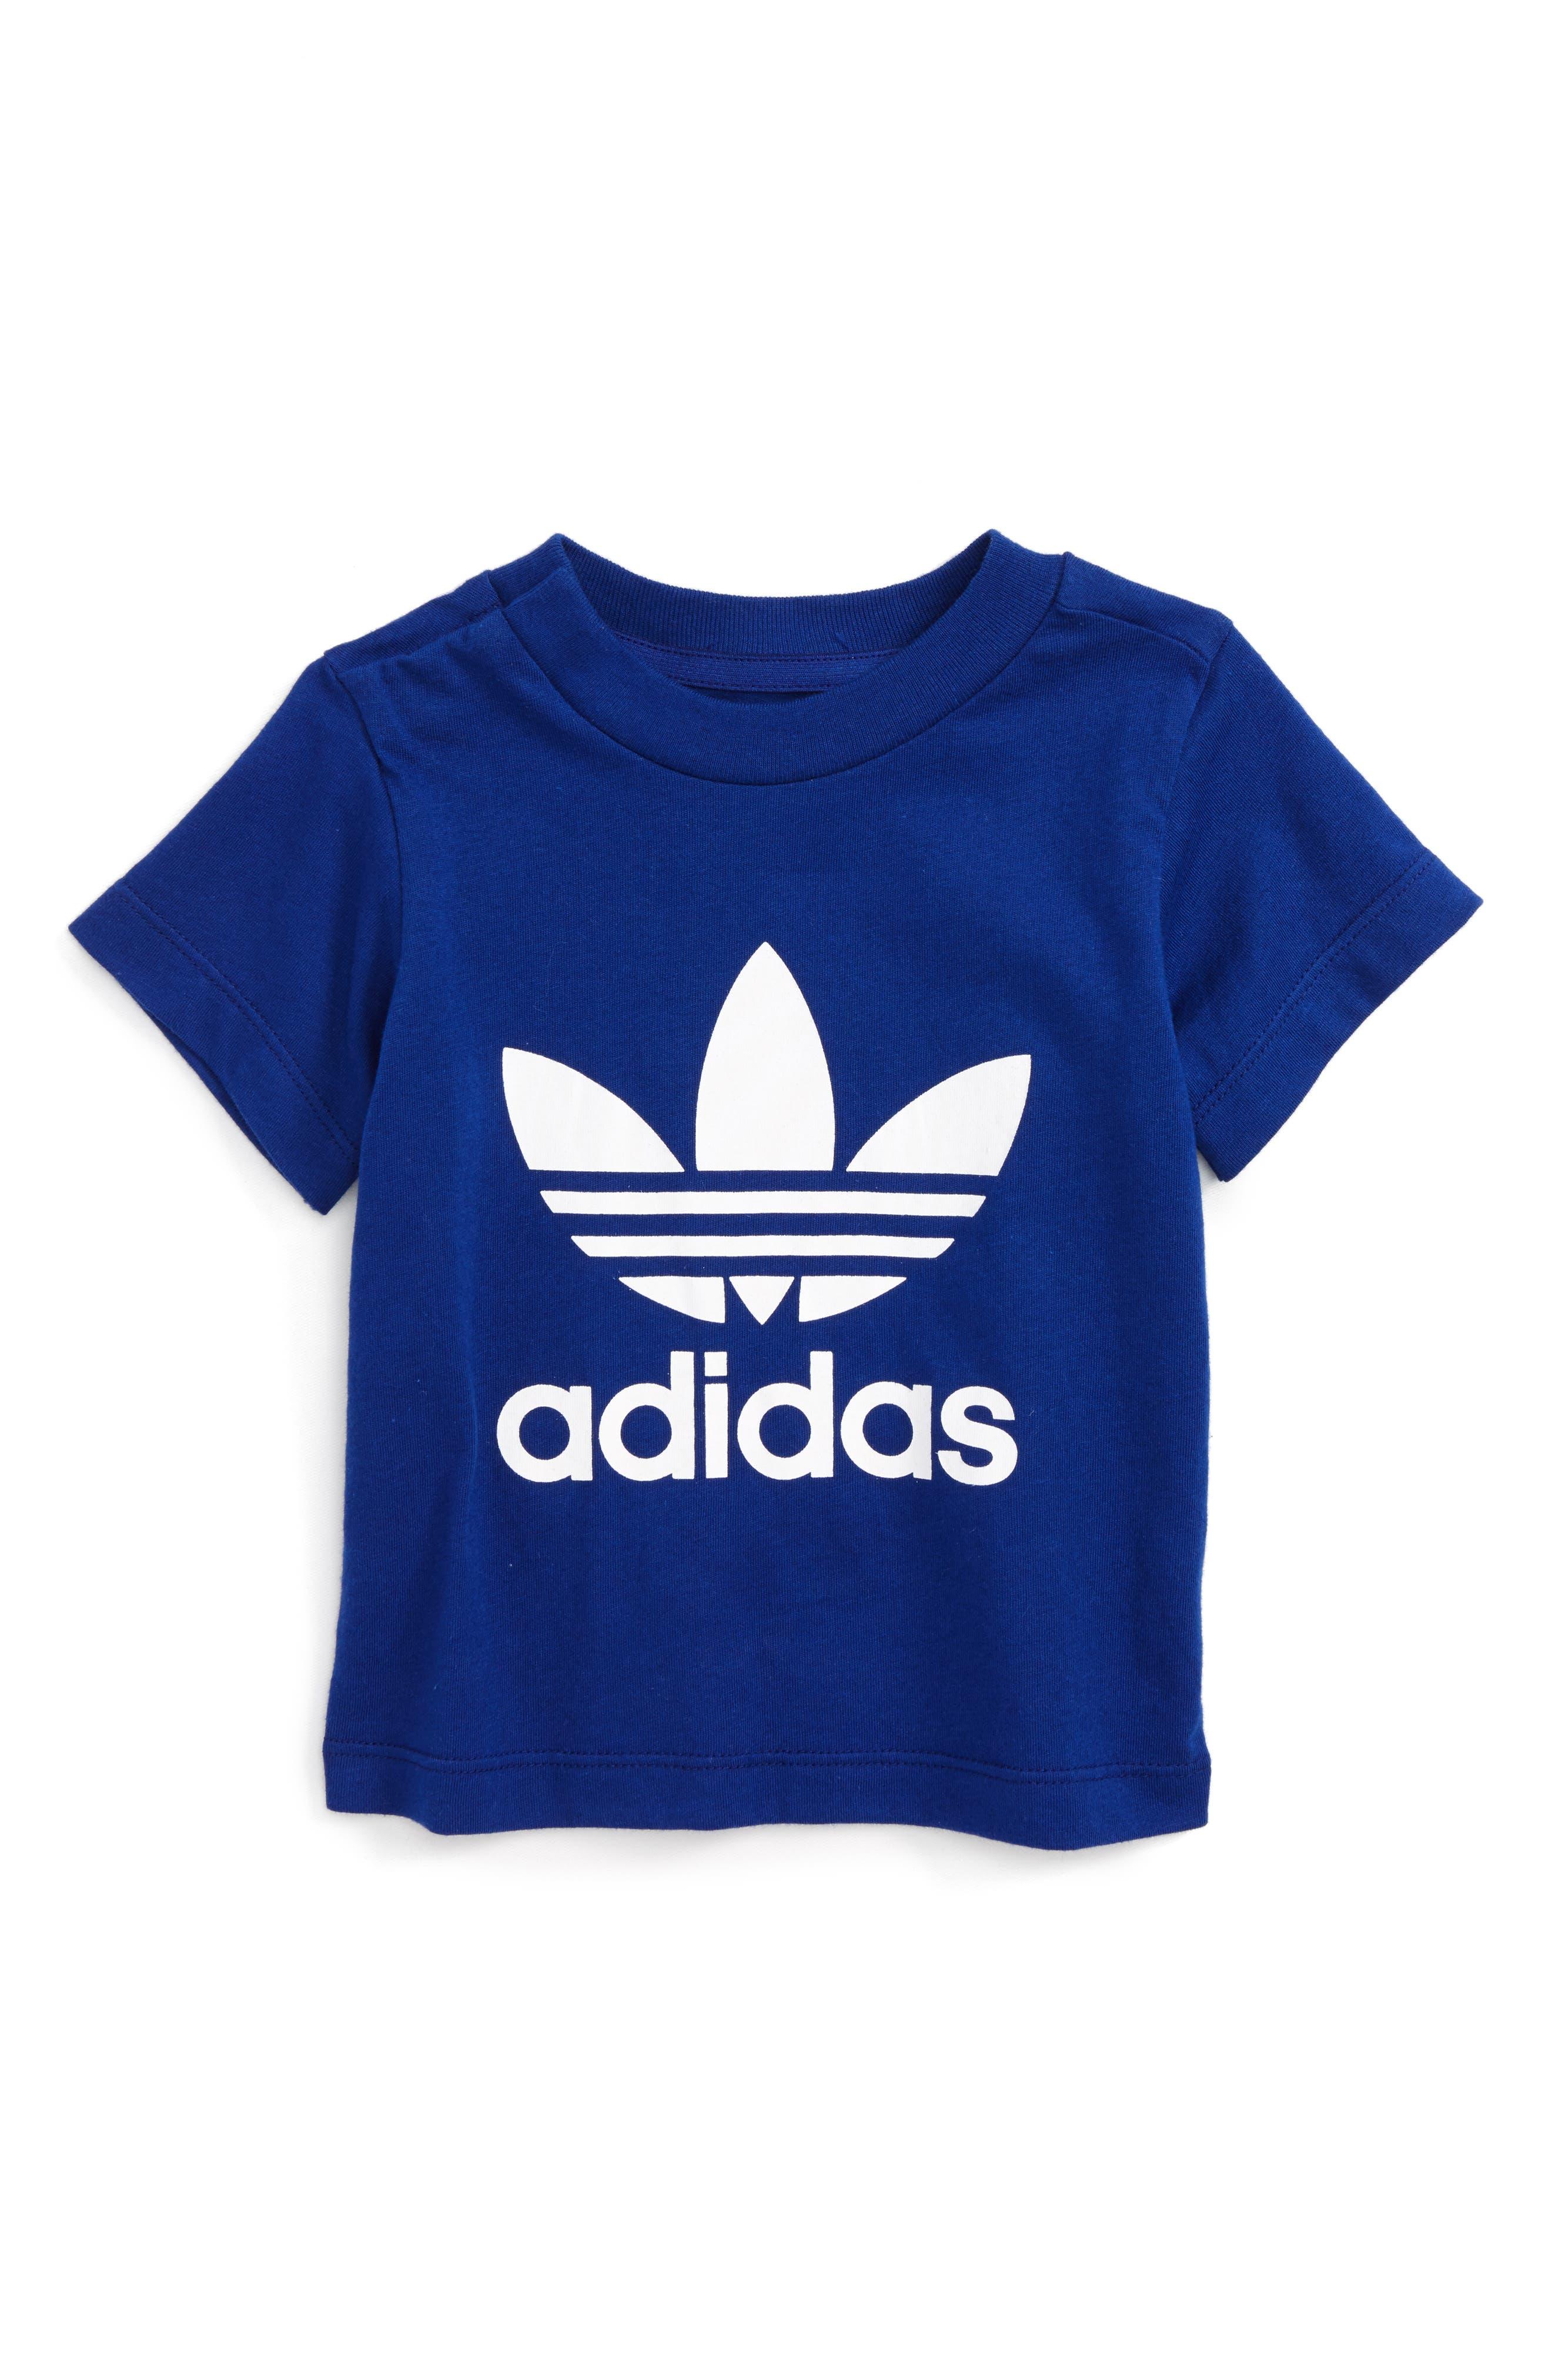 adidas Originals Logo Graphic T-Shirt (Baby)